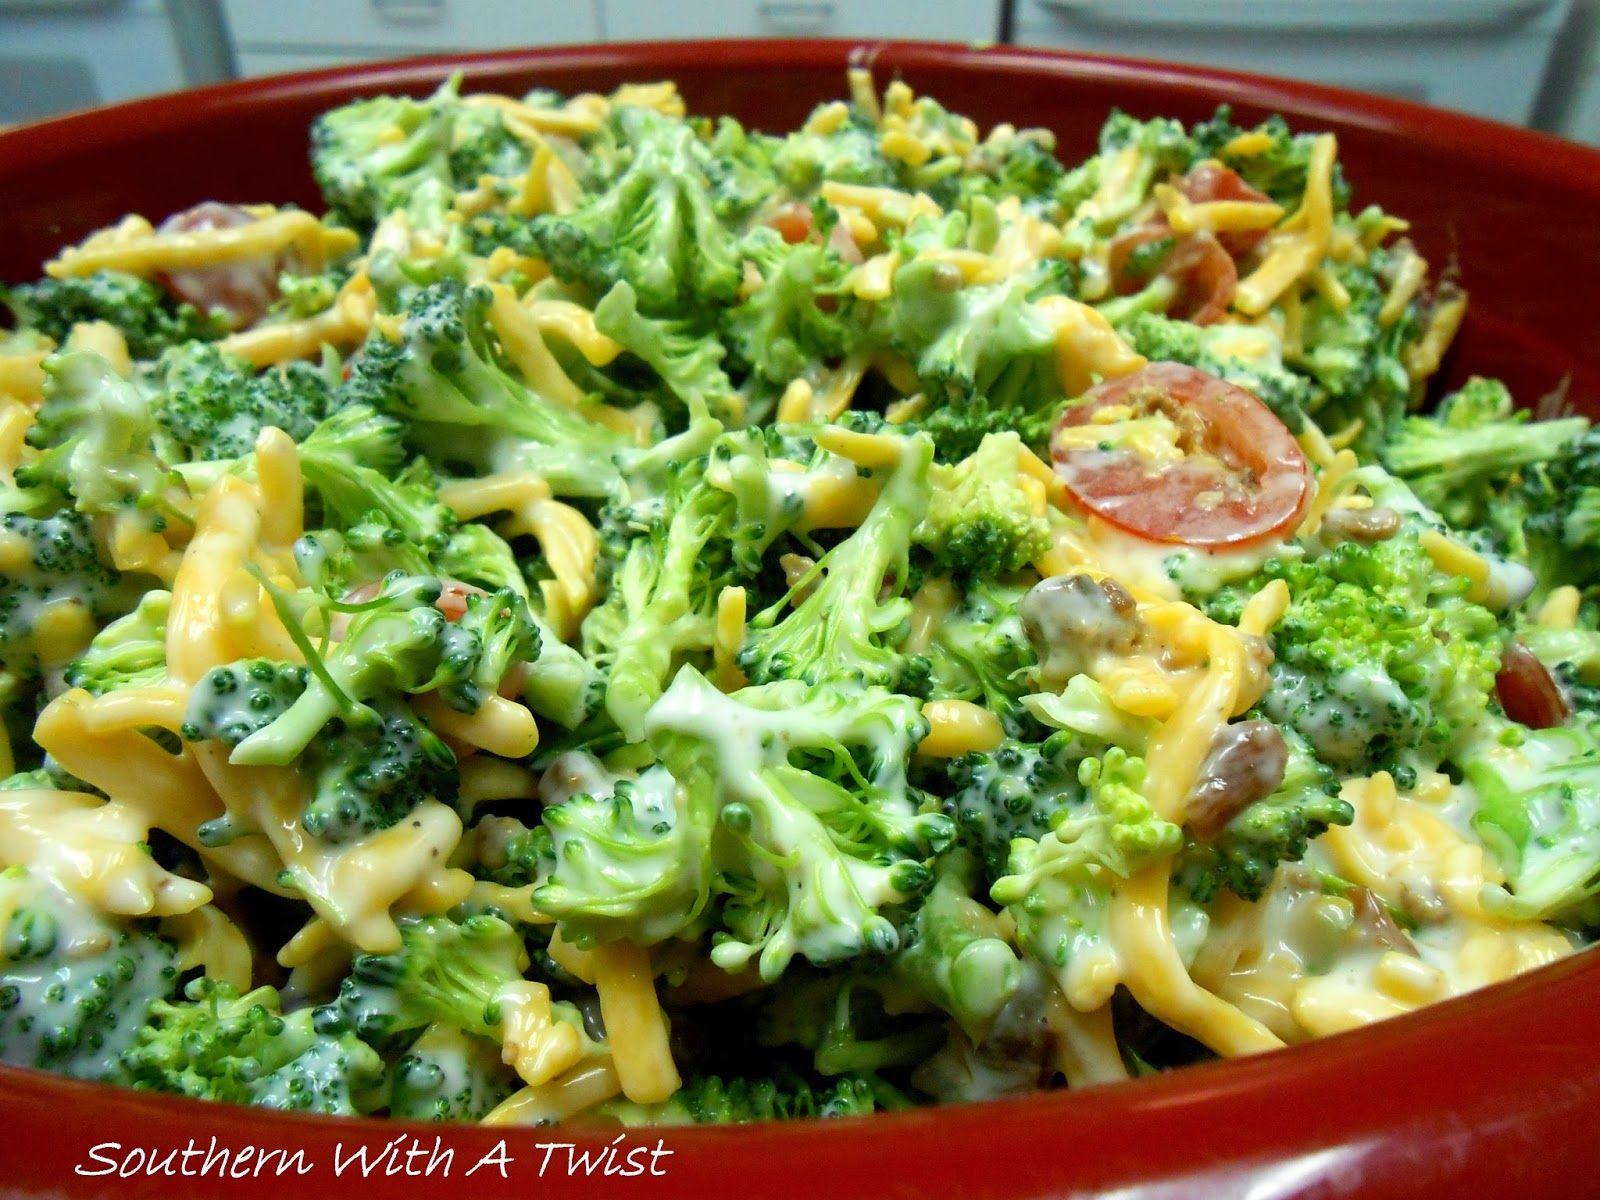 Southern With A Twist: Broccoli Salad